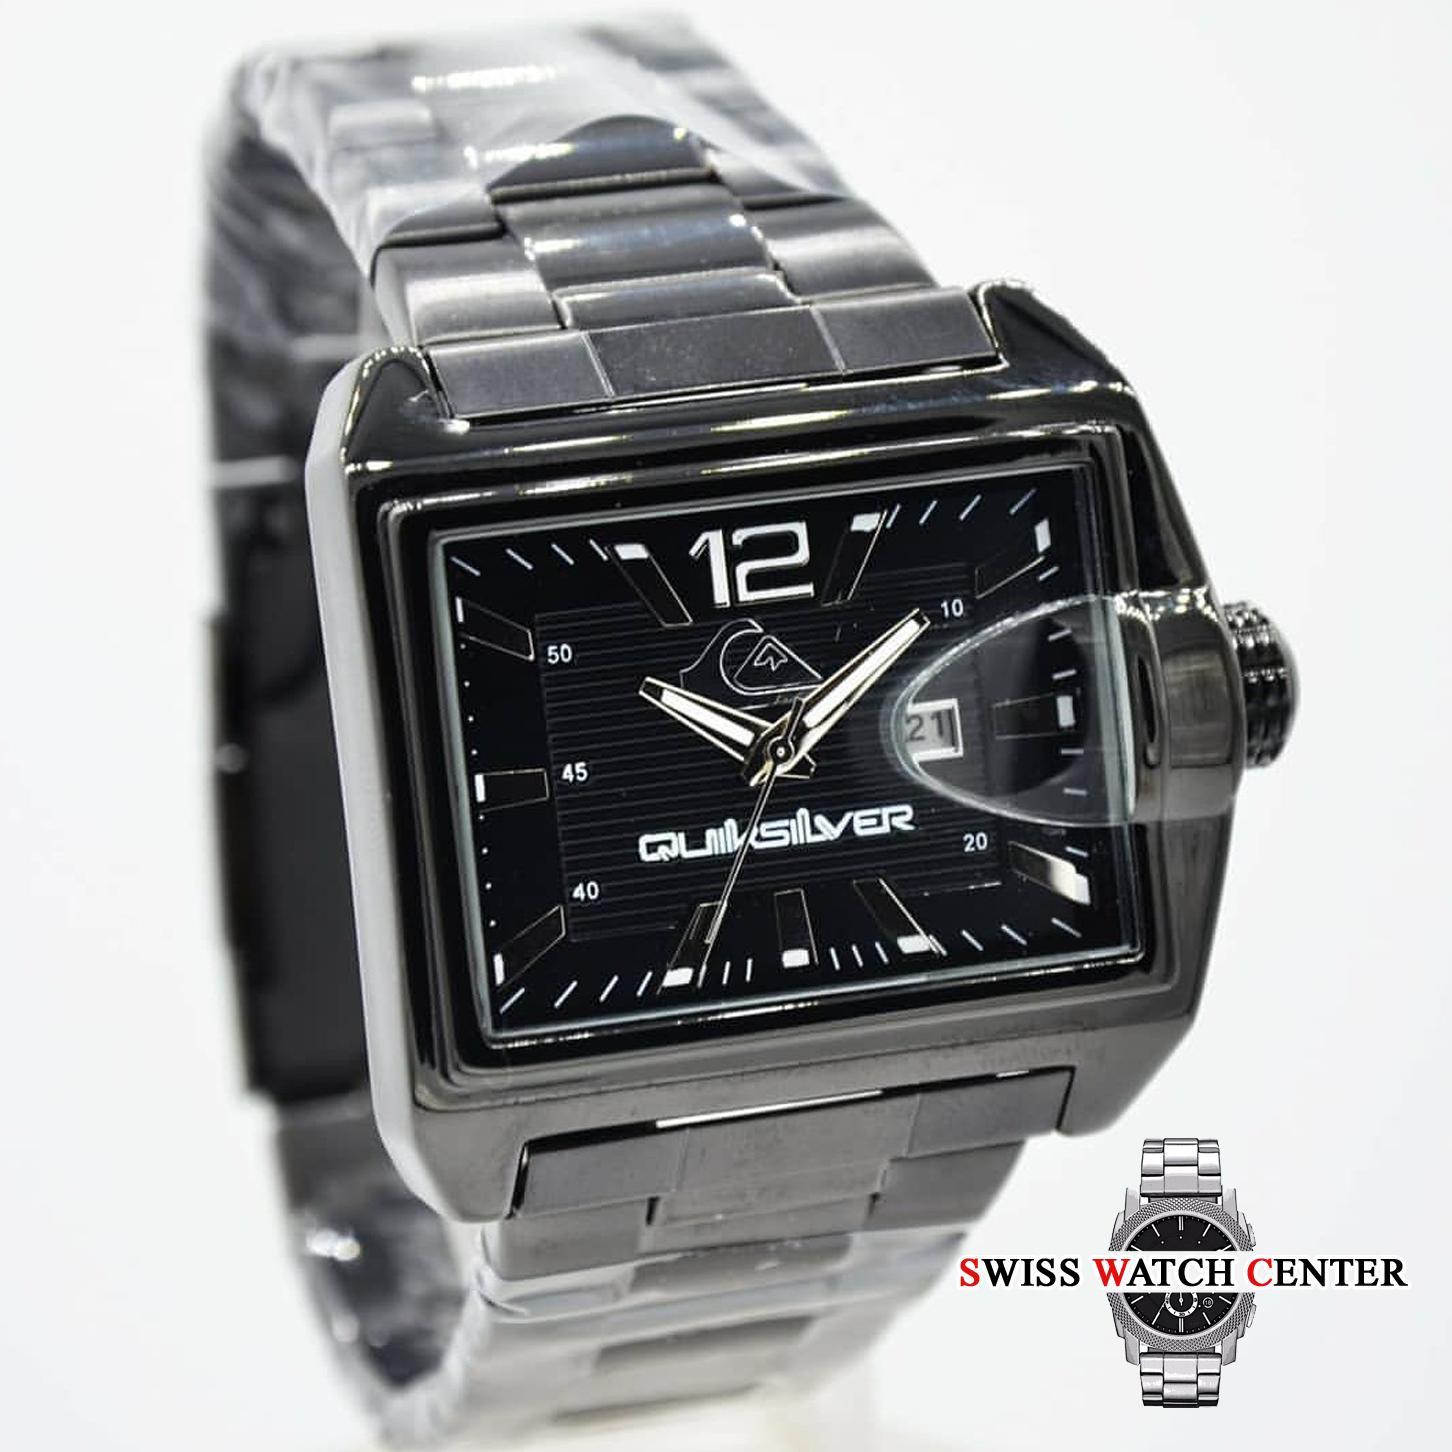 Jam Tangan Pria - Quiksilver  Swiss Army  Q Q  Alexandre Christie  Desain  kotak - Stainless Steel - Tanggal Aktif - fc1cacf065